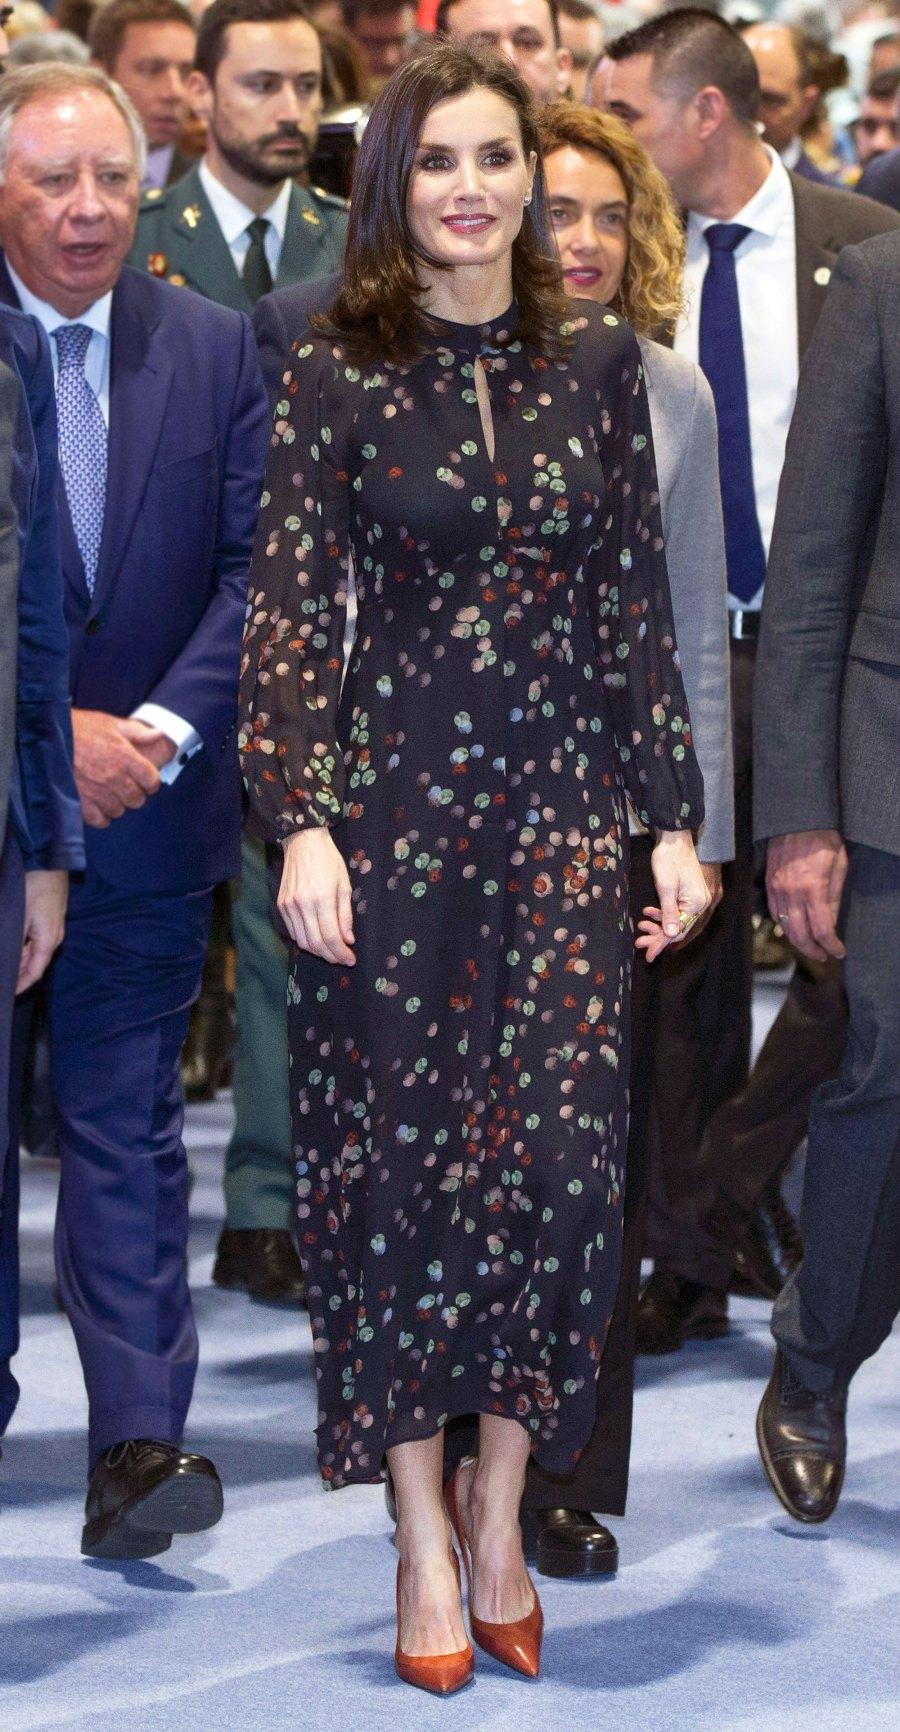 Queen Letizia Favorite Frock January 22, 2020